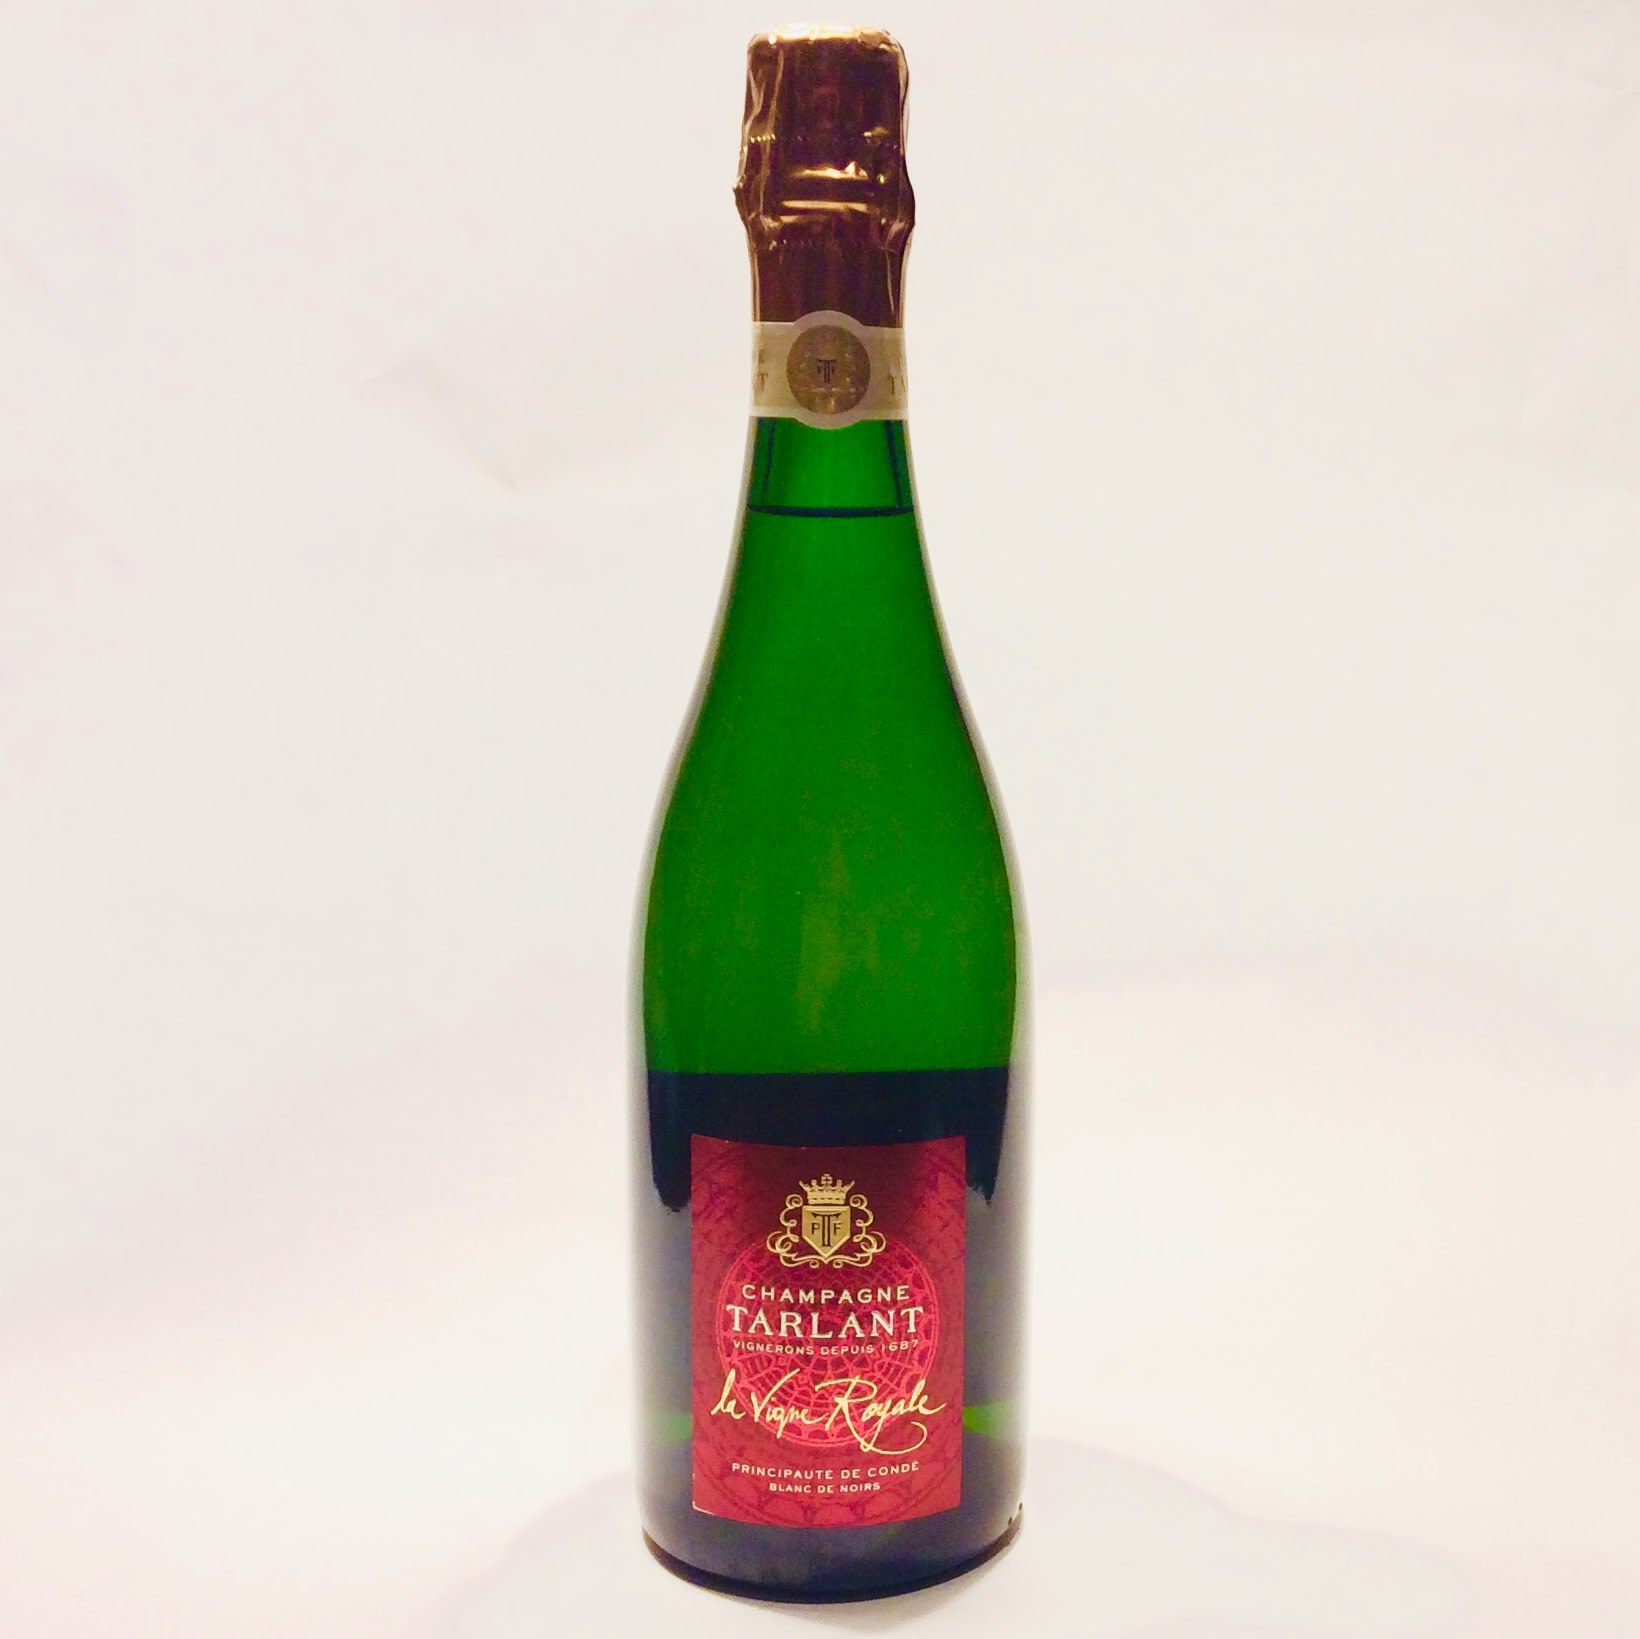 Champagne Tarlant La Vigne Royale Brut Nature 2003 (750 ml)